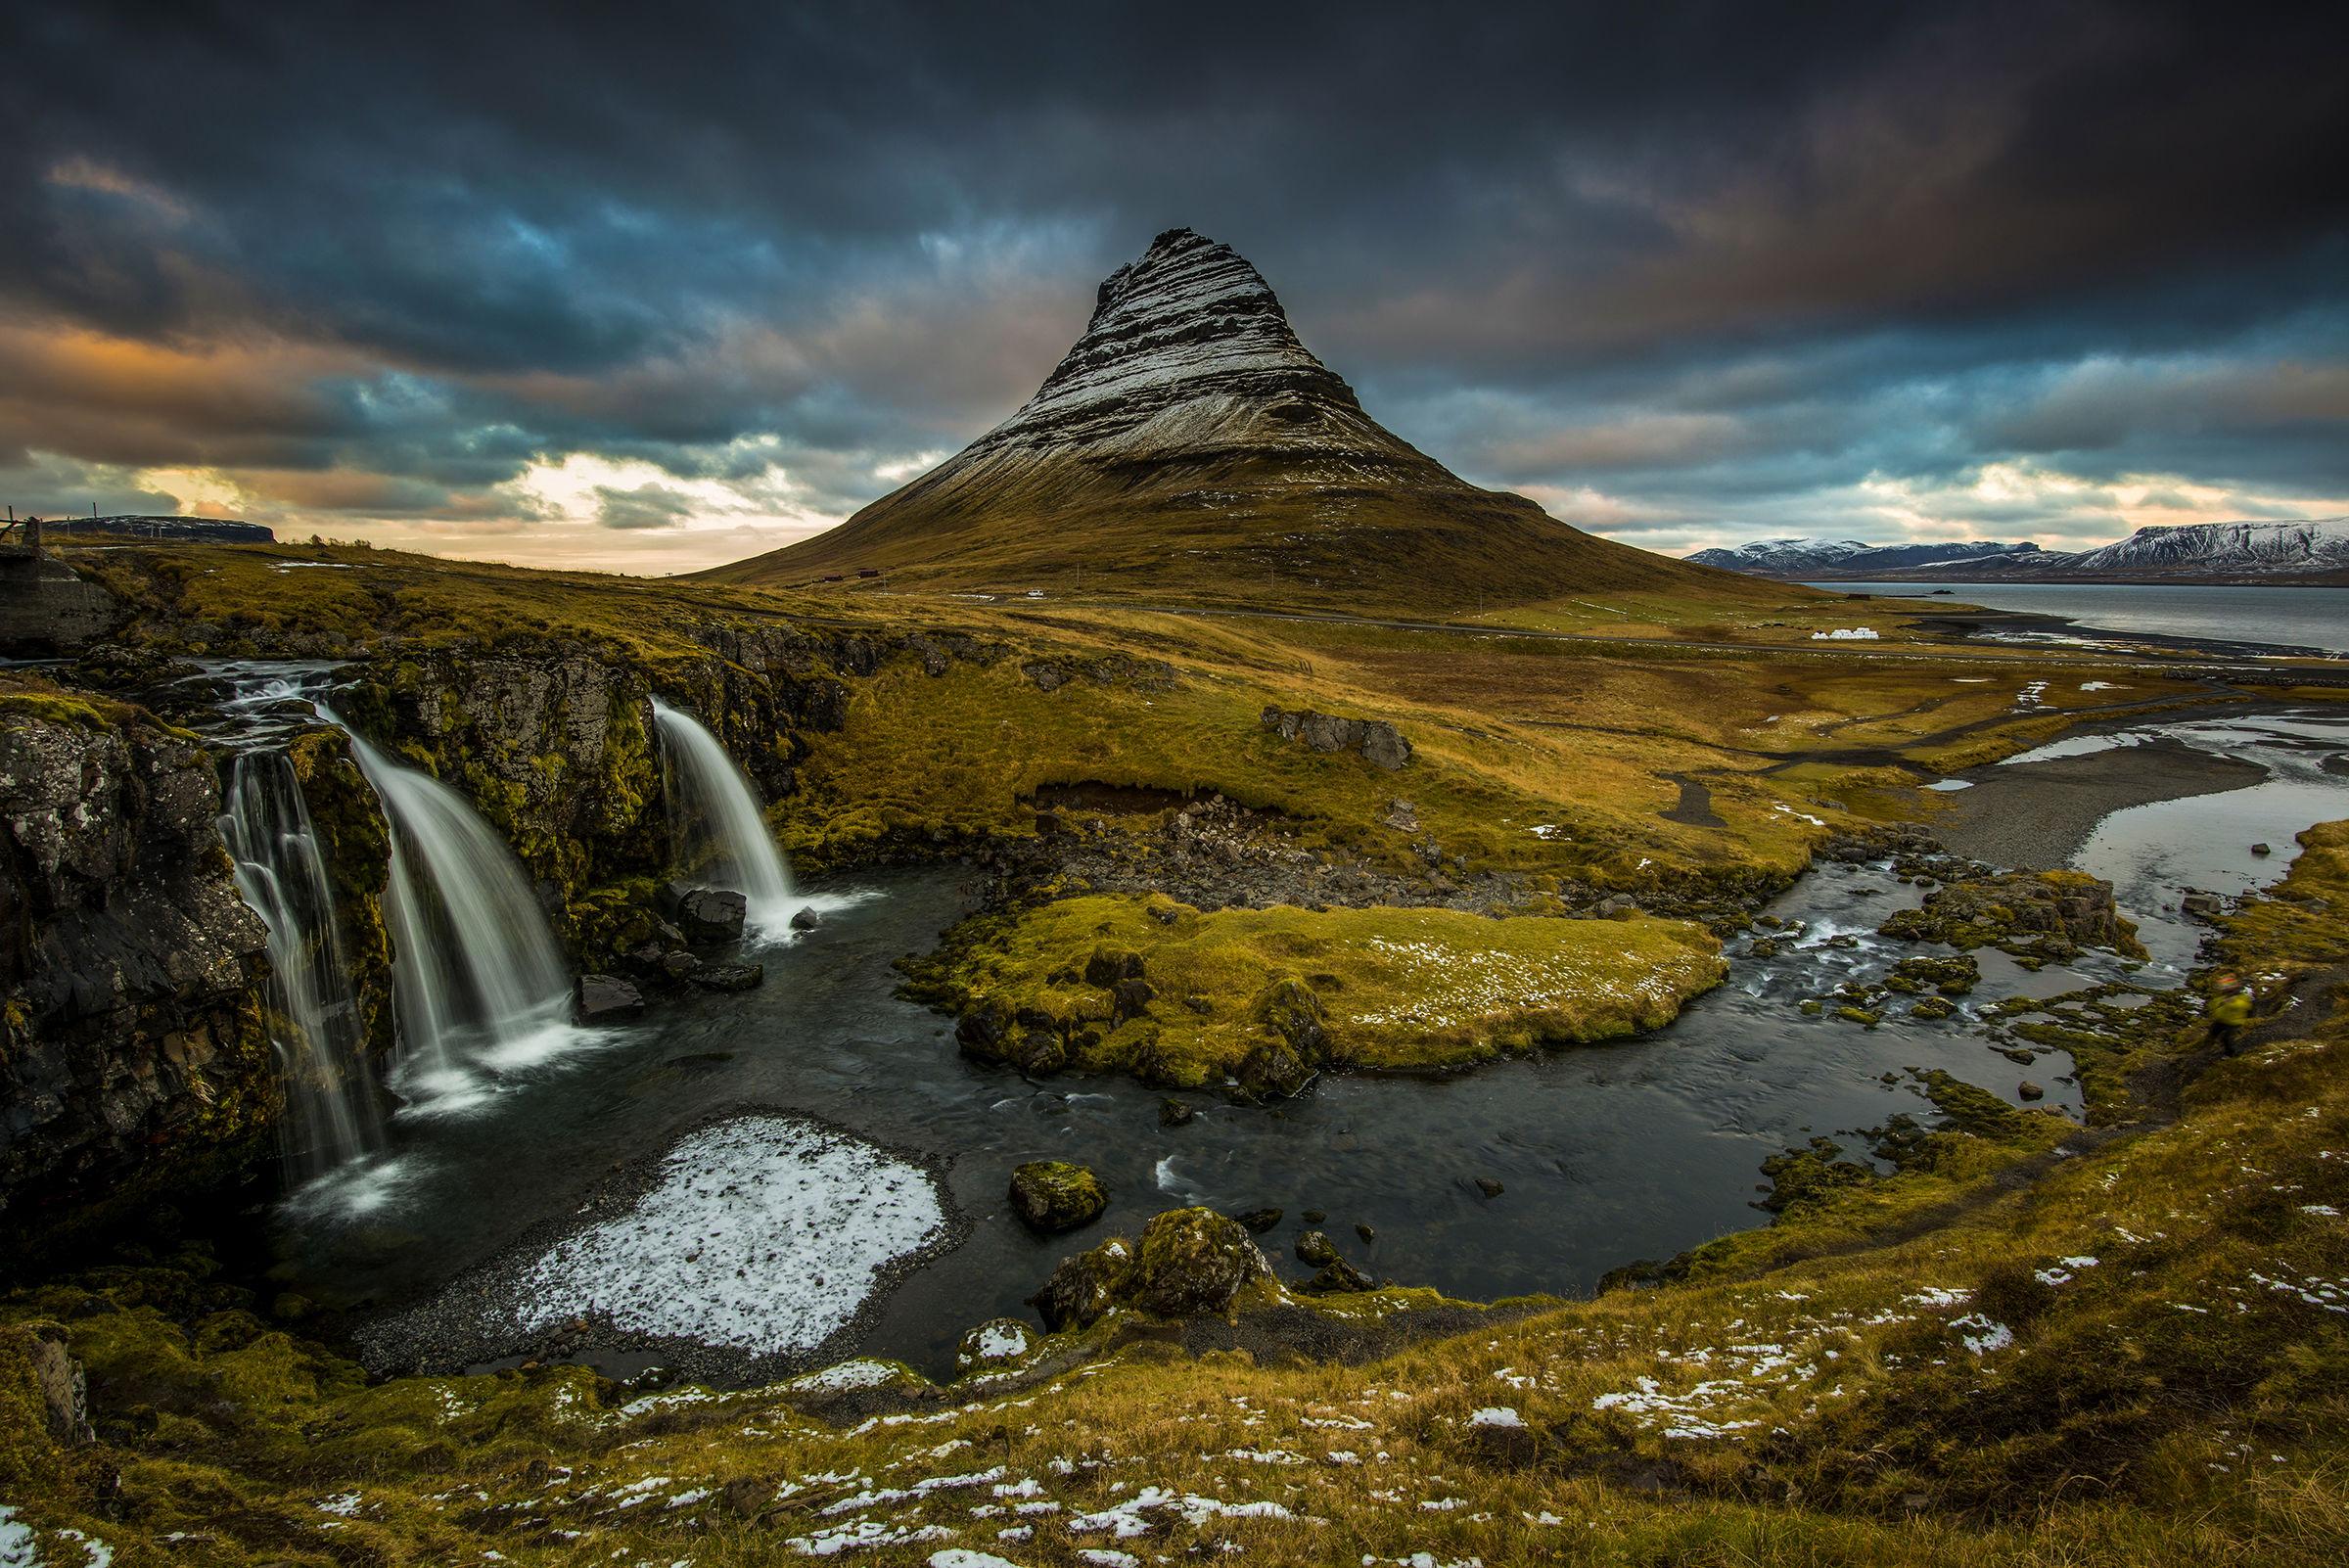 Iceland - Kirkjufell 2.0...